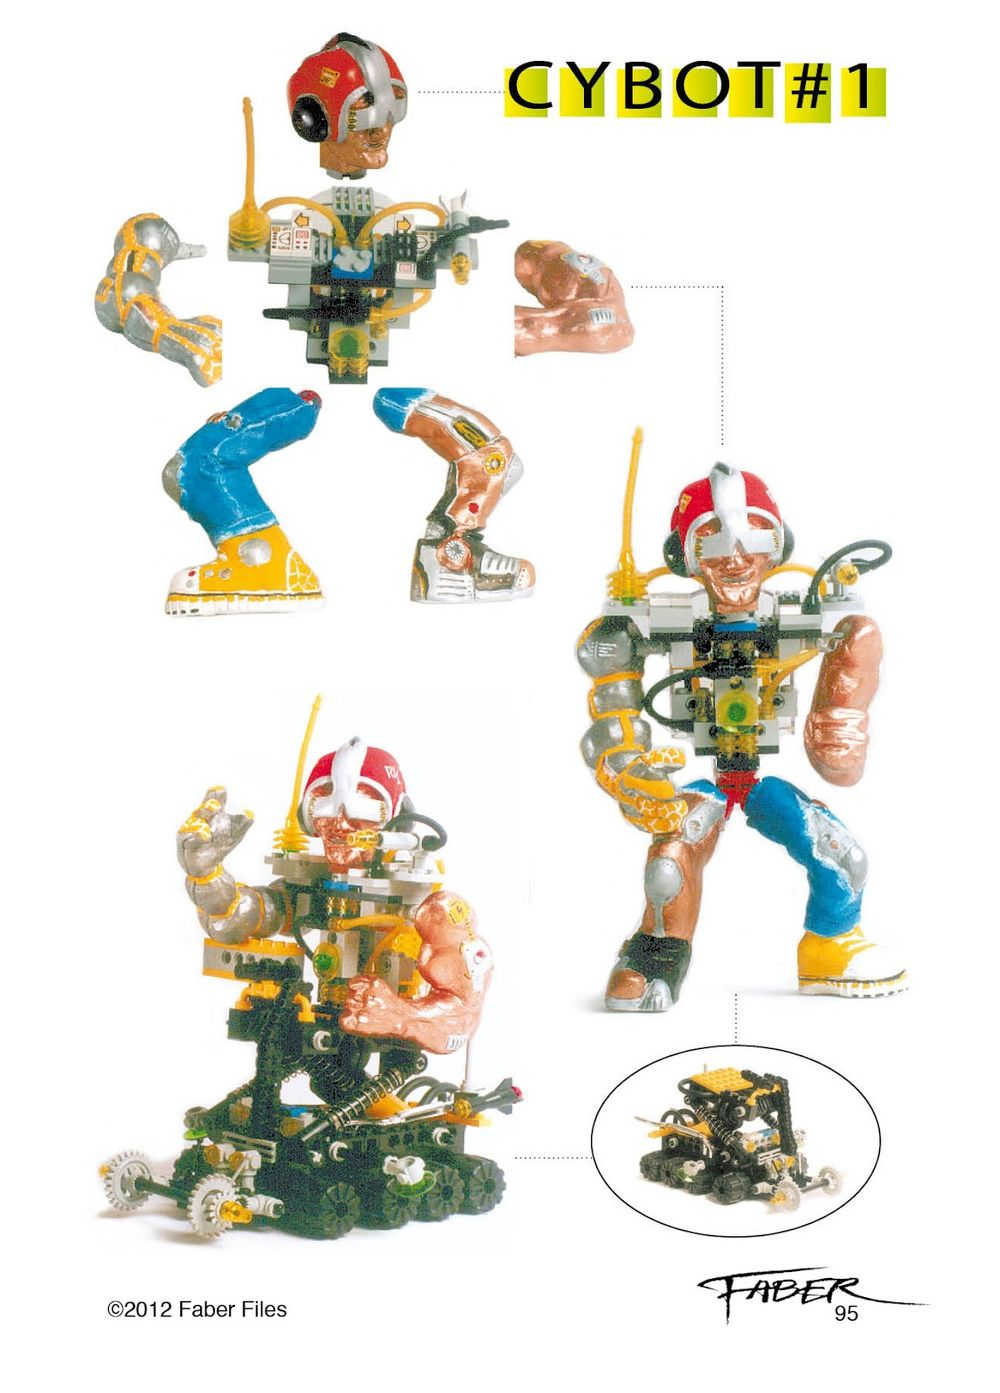 cybots2.jpg